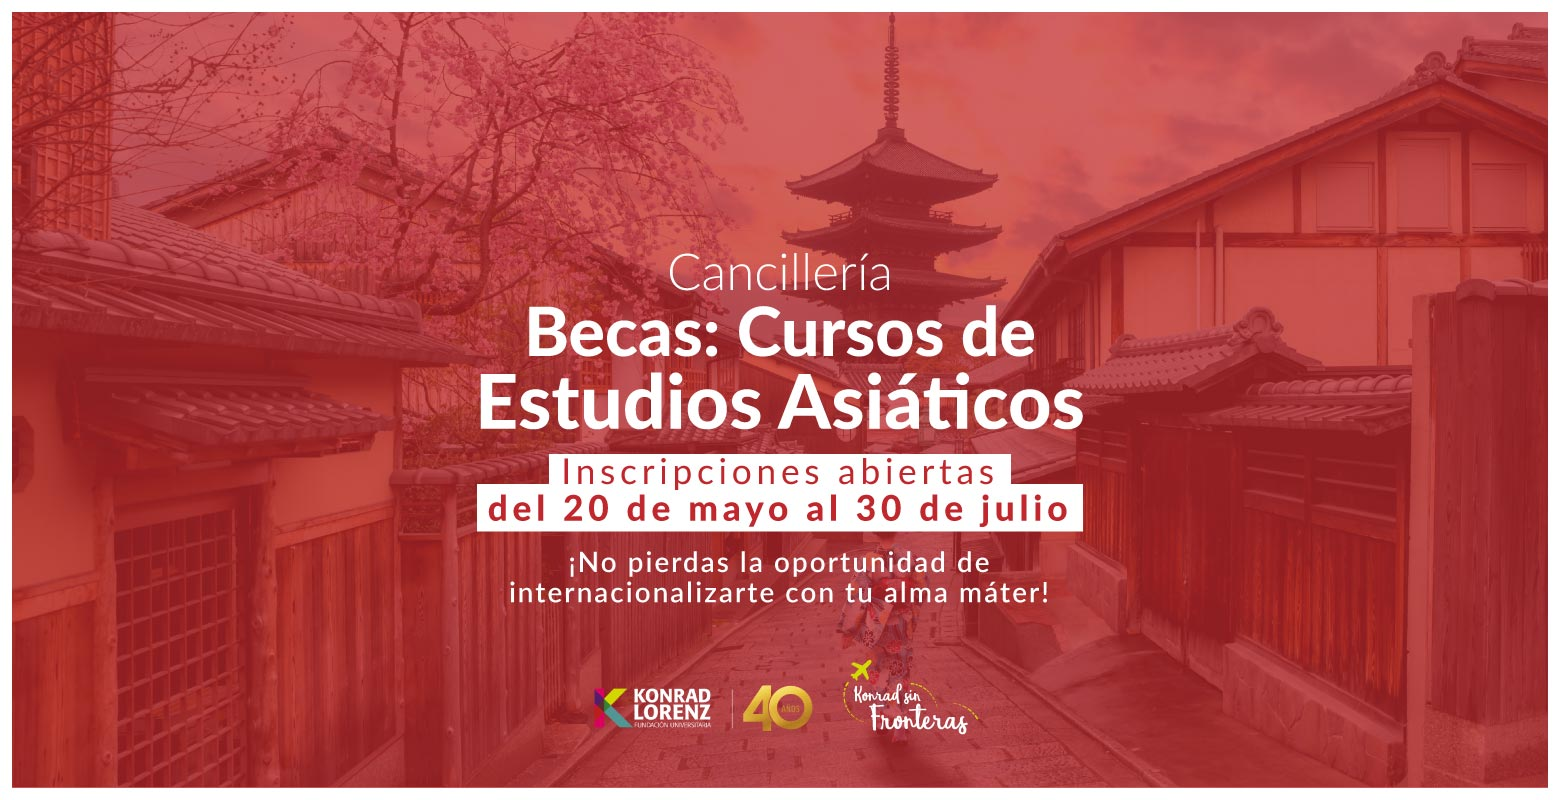 Becas: Cursos de Estudios Asiáticos